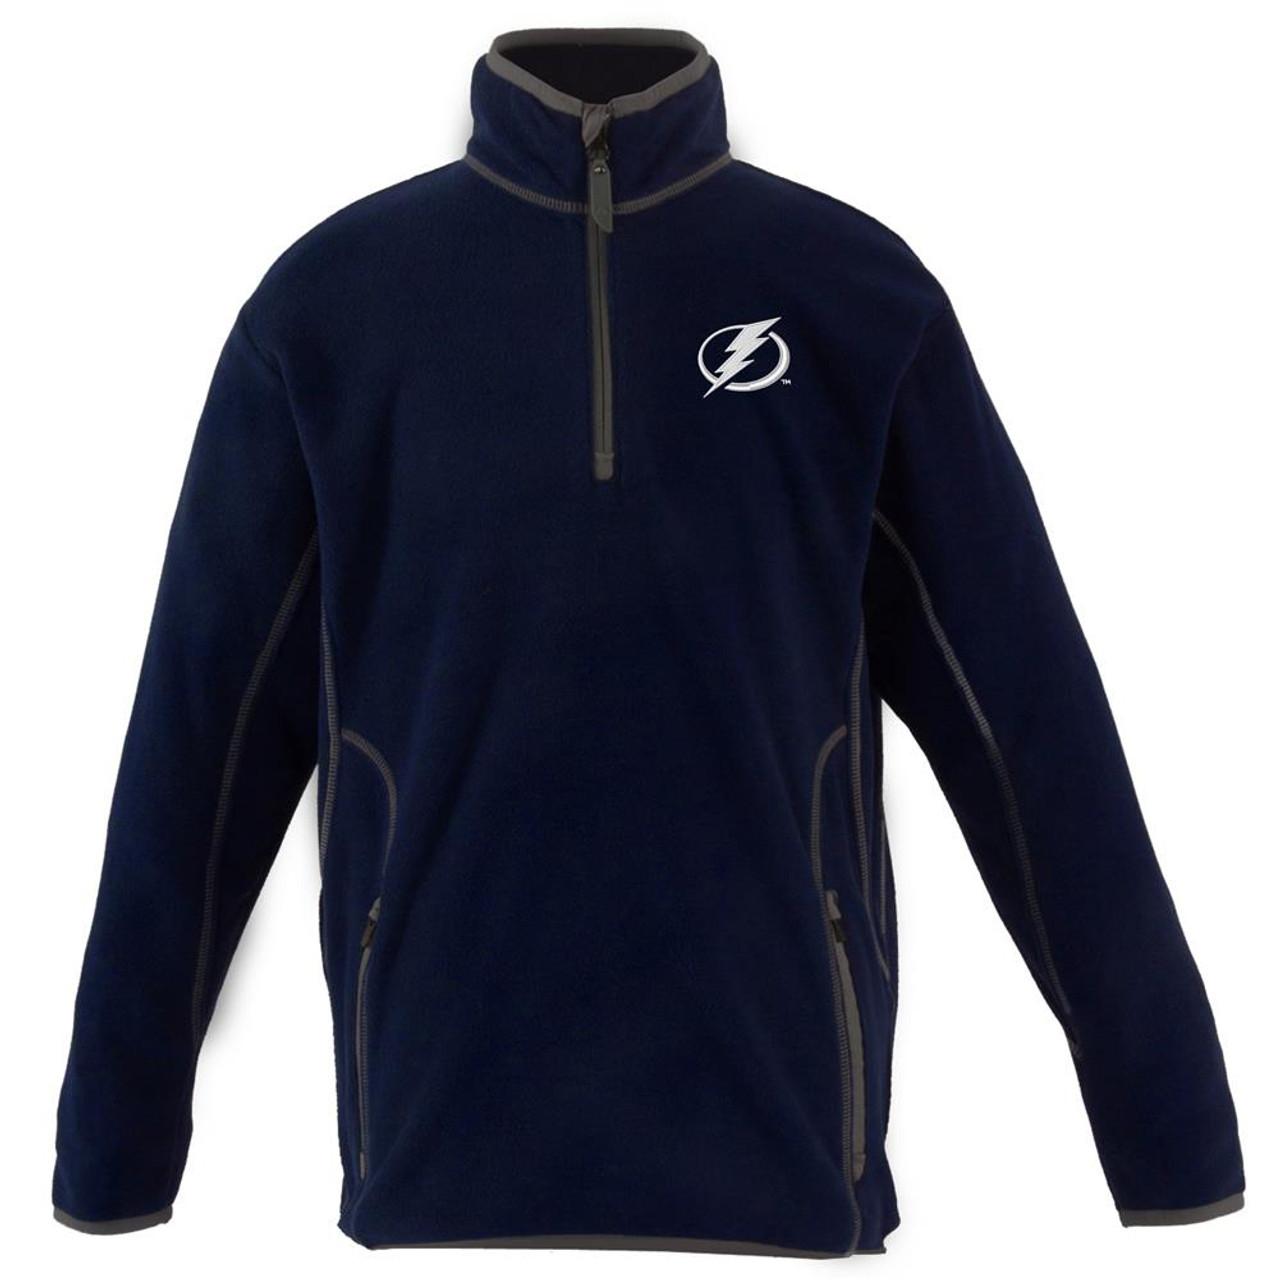 Lighting Jacket: Tampa Bay Lightning Youth Pullover Jacket